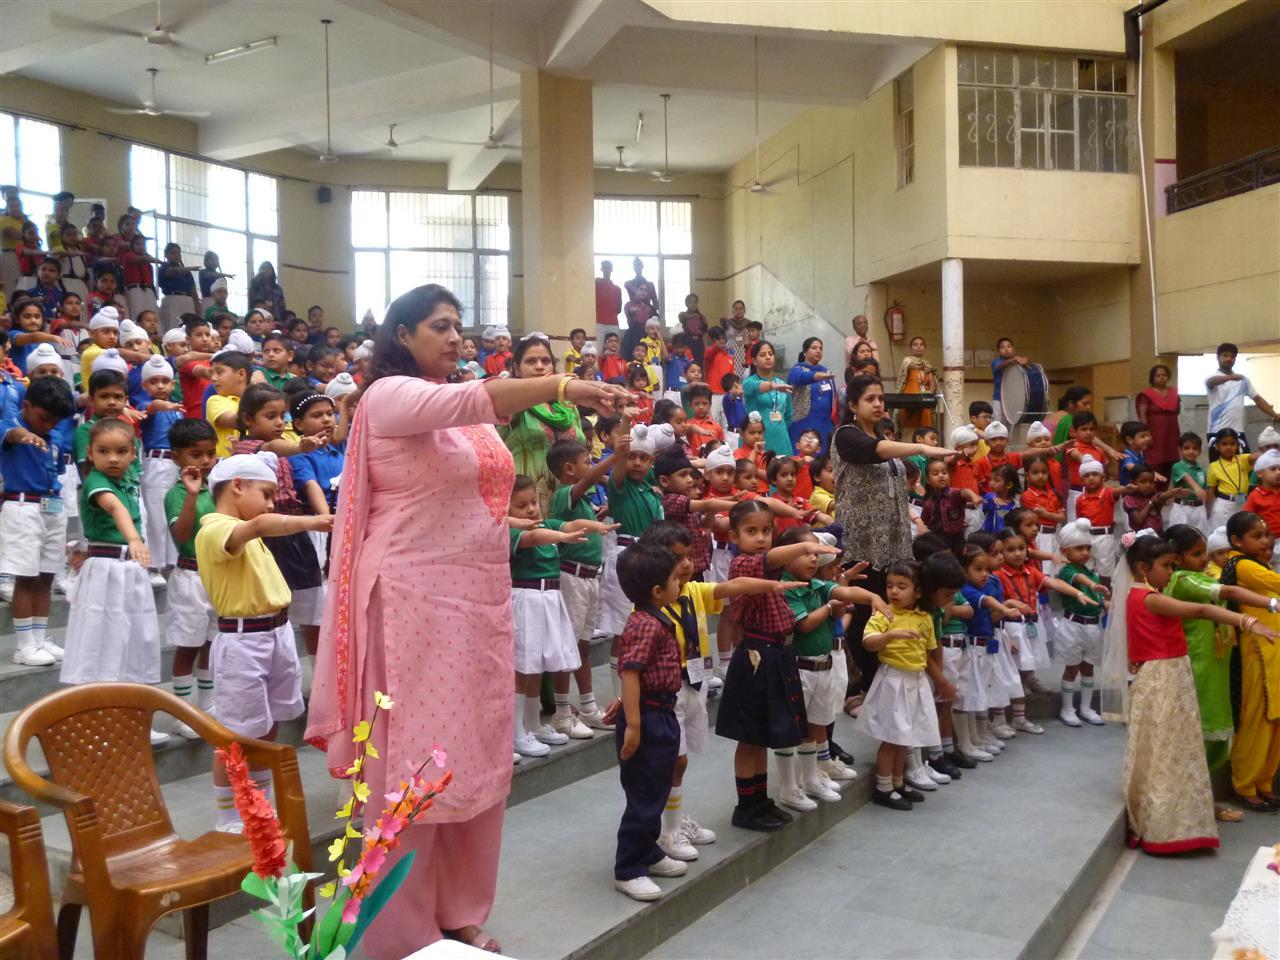 AKSIPS-65 CELEBRATES WORLD HERITAGE DAY | AKSIPS 65 Chandigarh